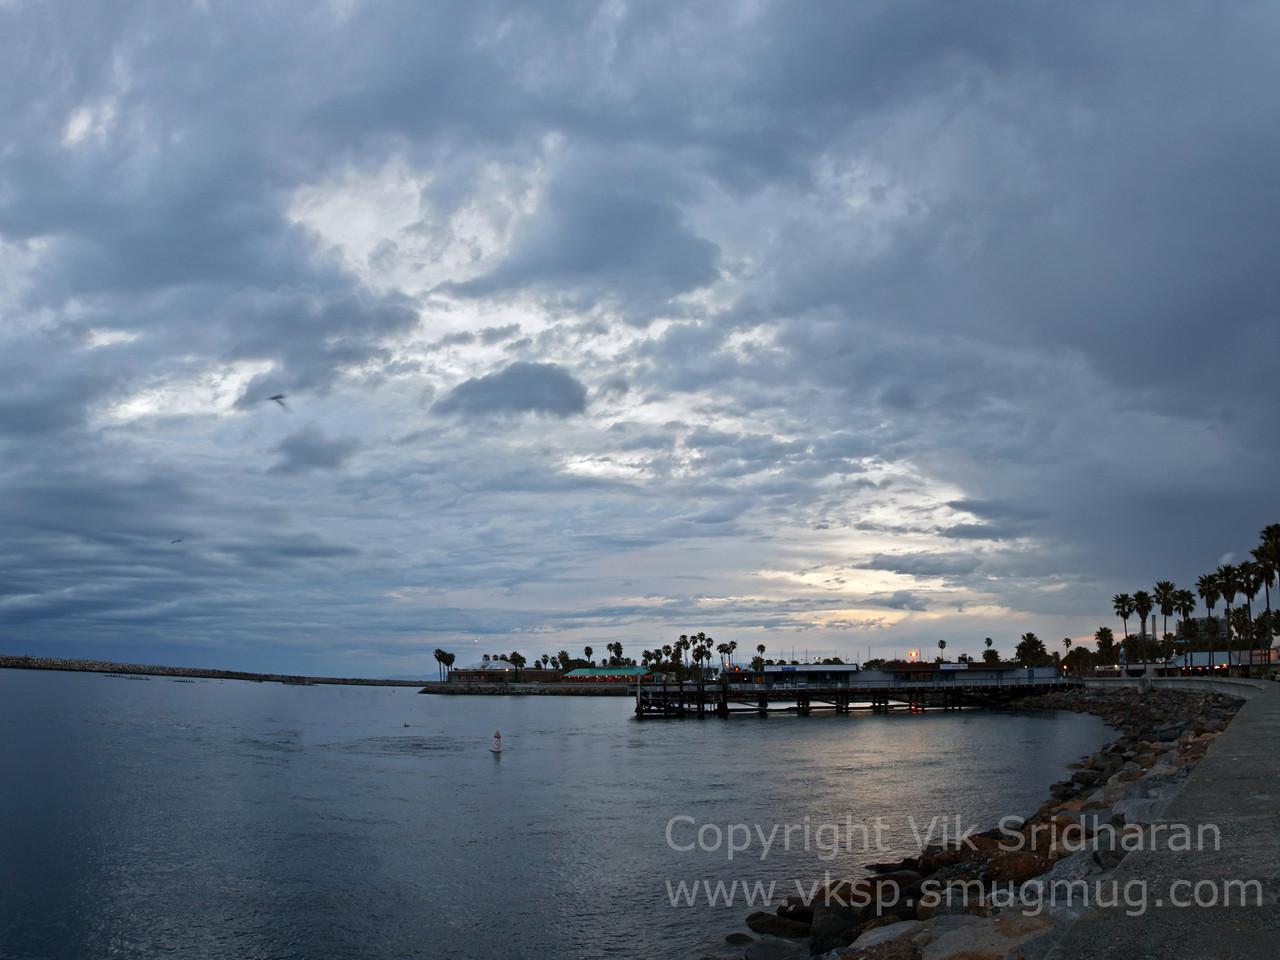 http://www.vksphoto.com/Landscapes/California/Dusk-in-Redondo-Beach/i-kQPtxFq/0/X2/UntitledPanorama1-X2.jpg